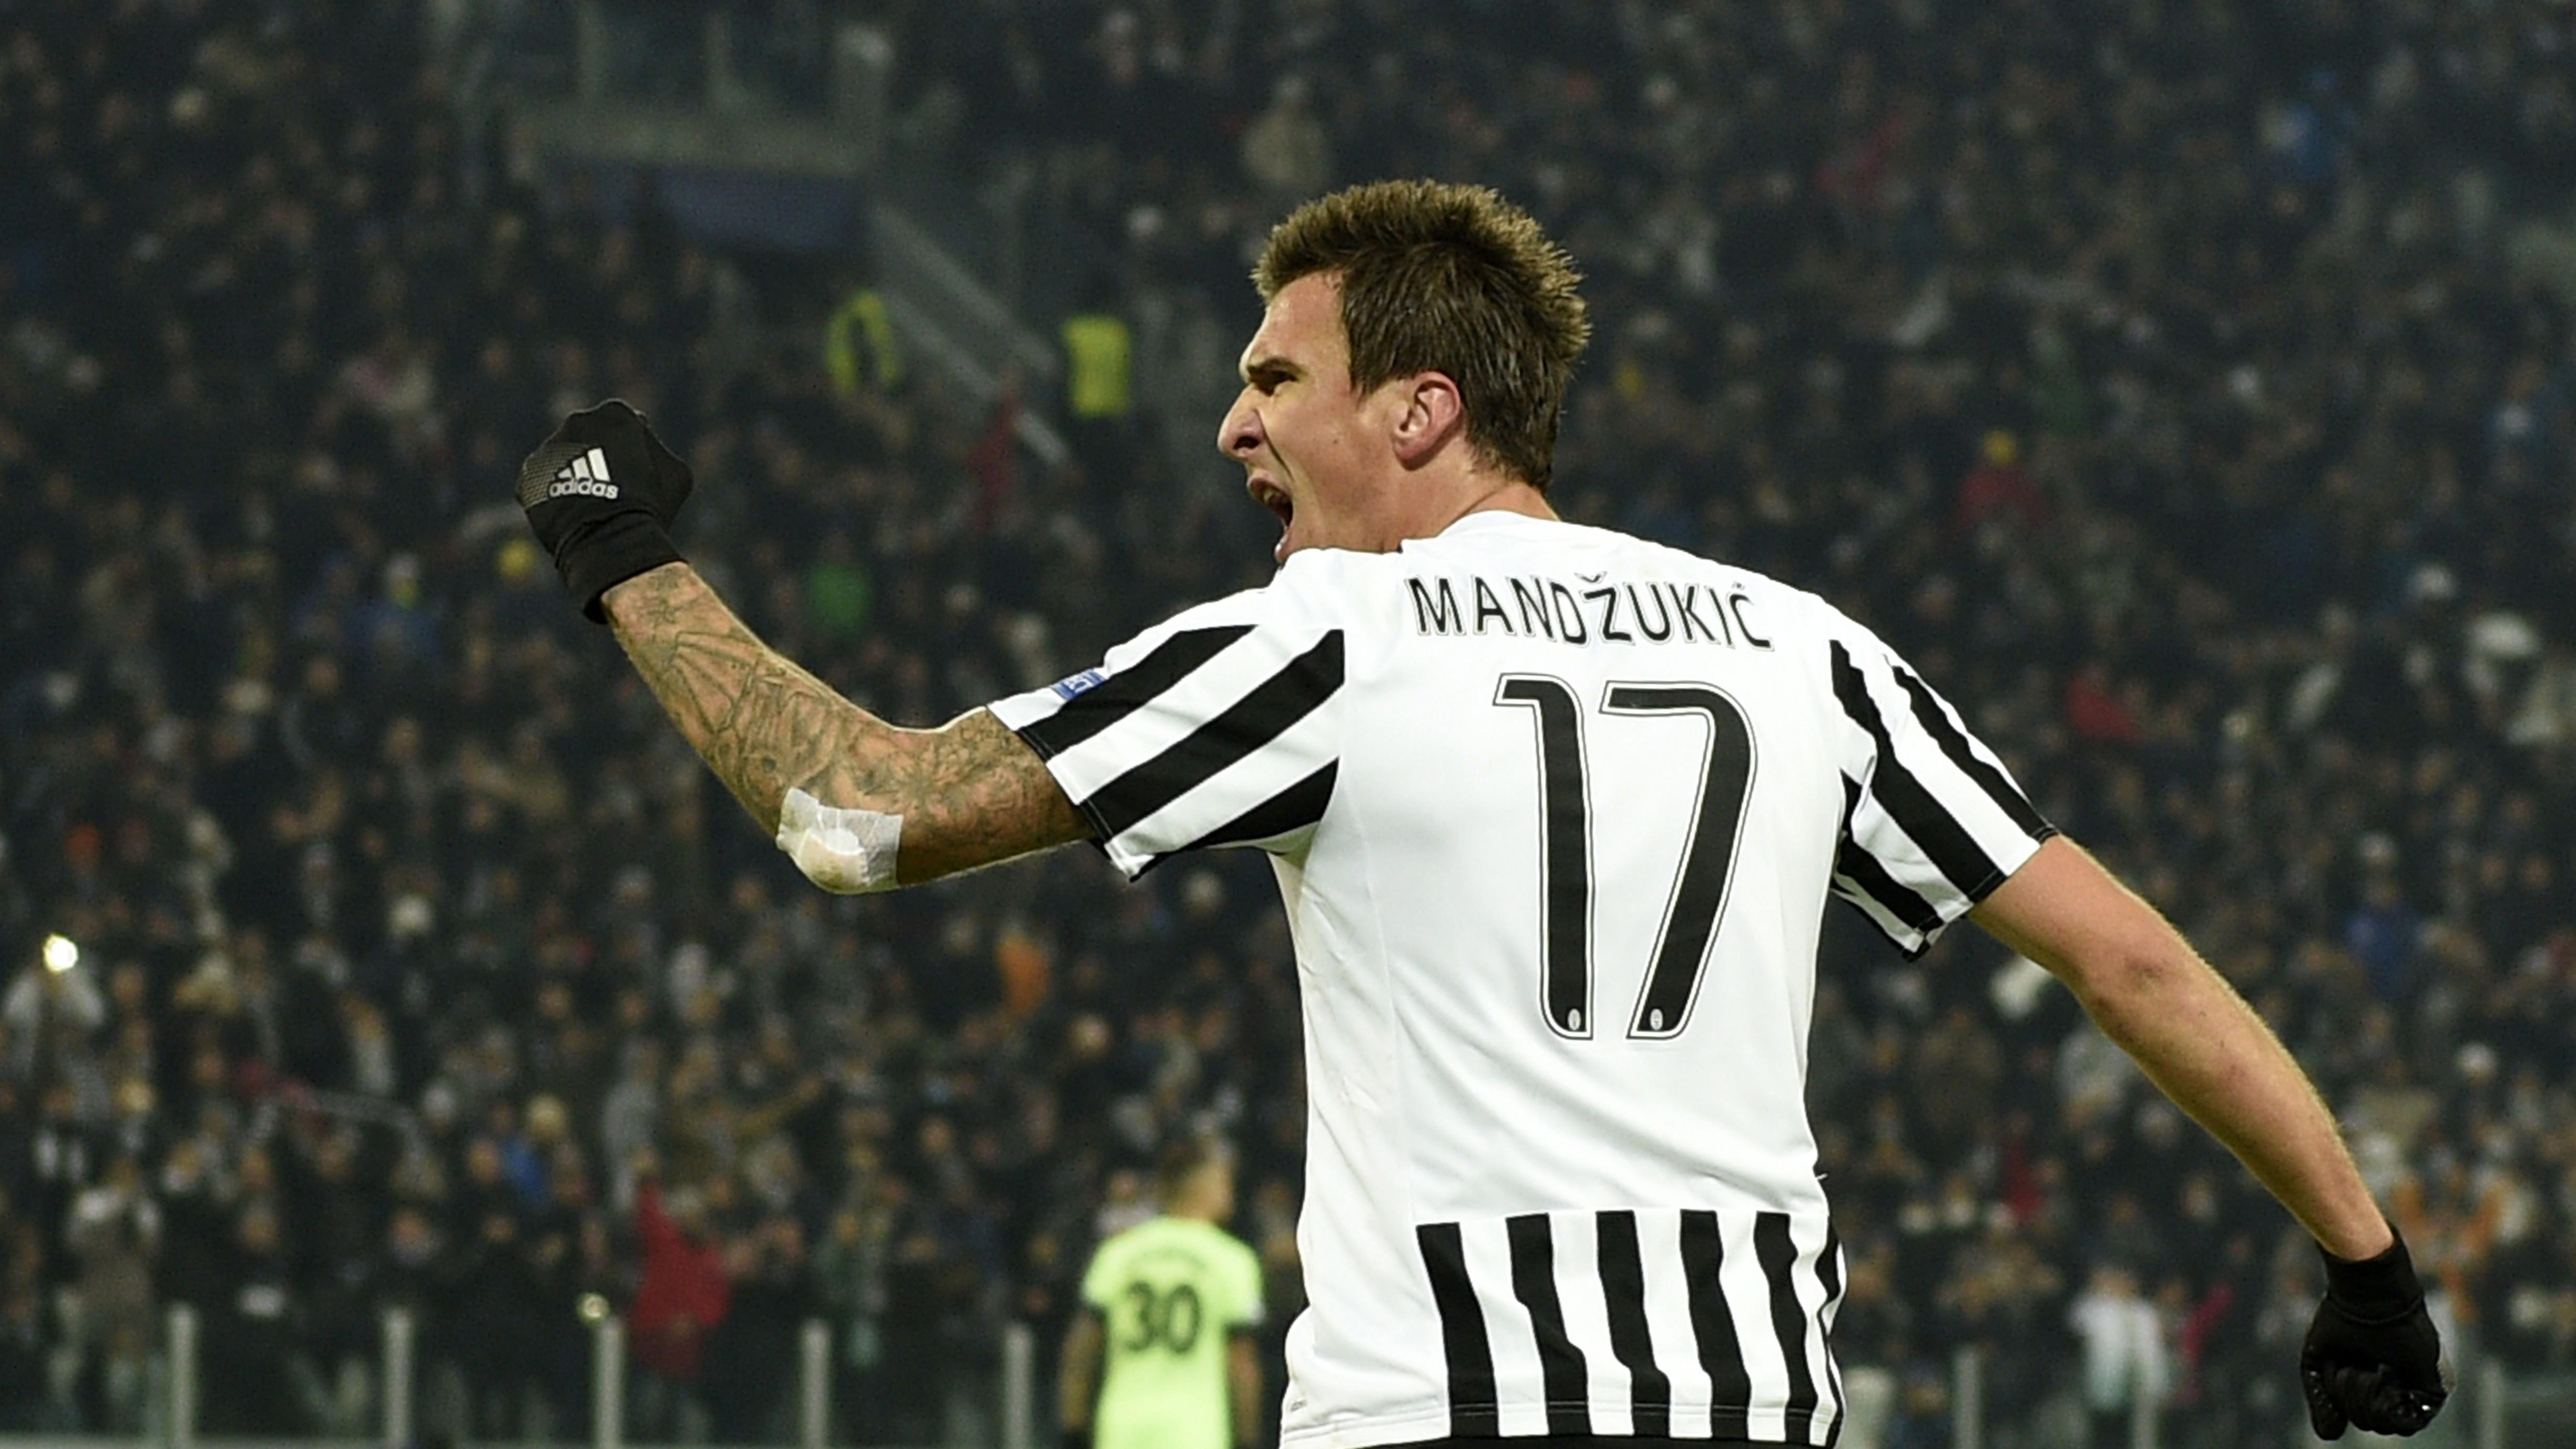 Urlo Juventus, Super Mario Mandzukic rinnova: adesso è ufficiale